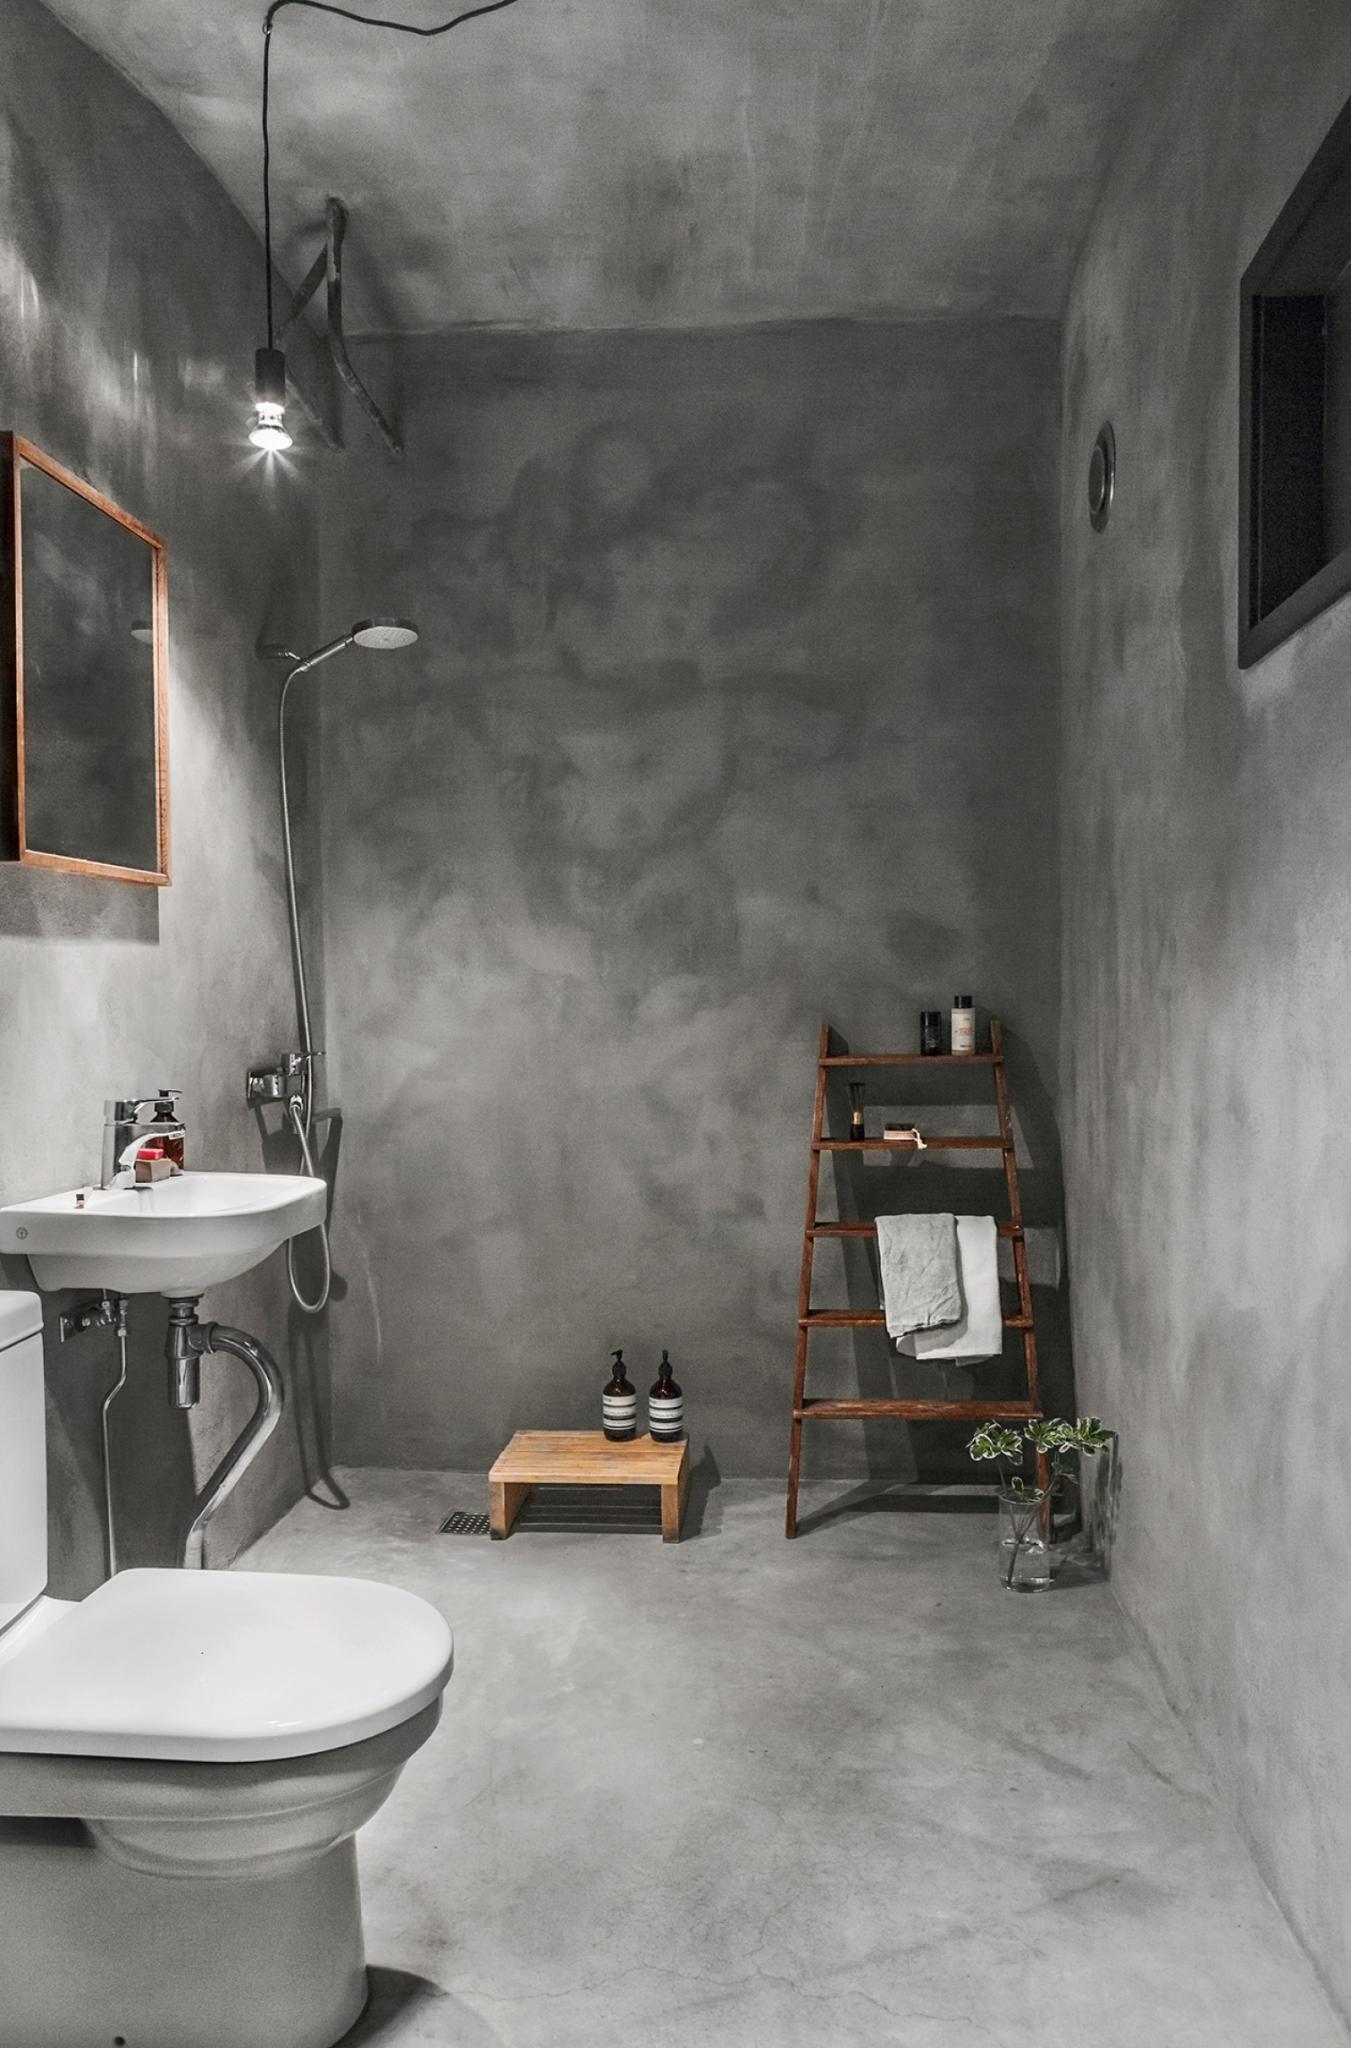 Concrete bathroom coco lapine designcoco lapine design for Concrete bathroom ideas